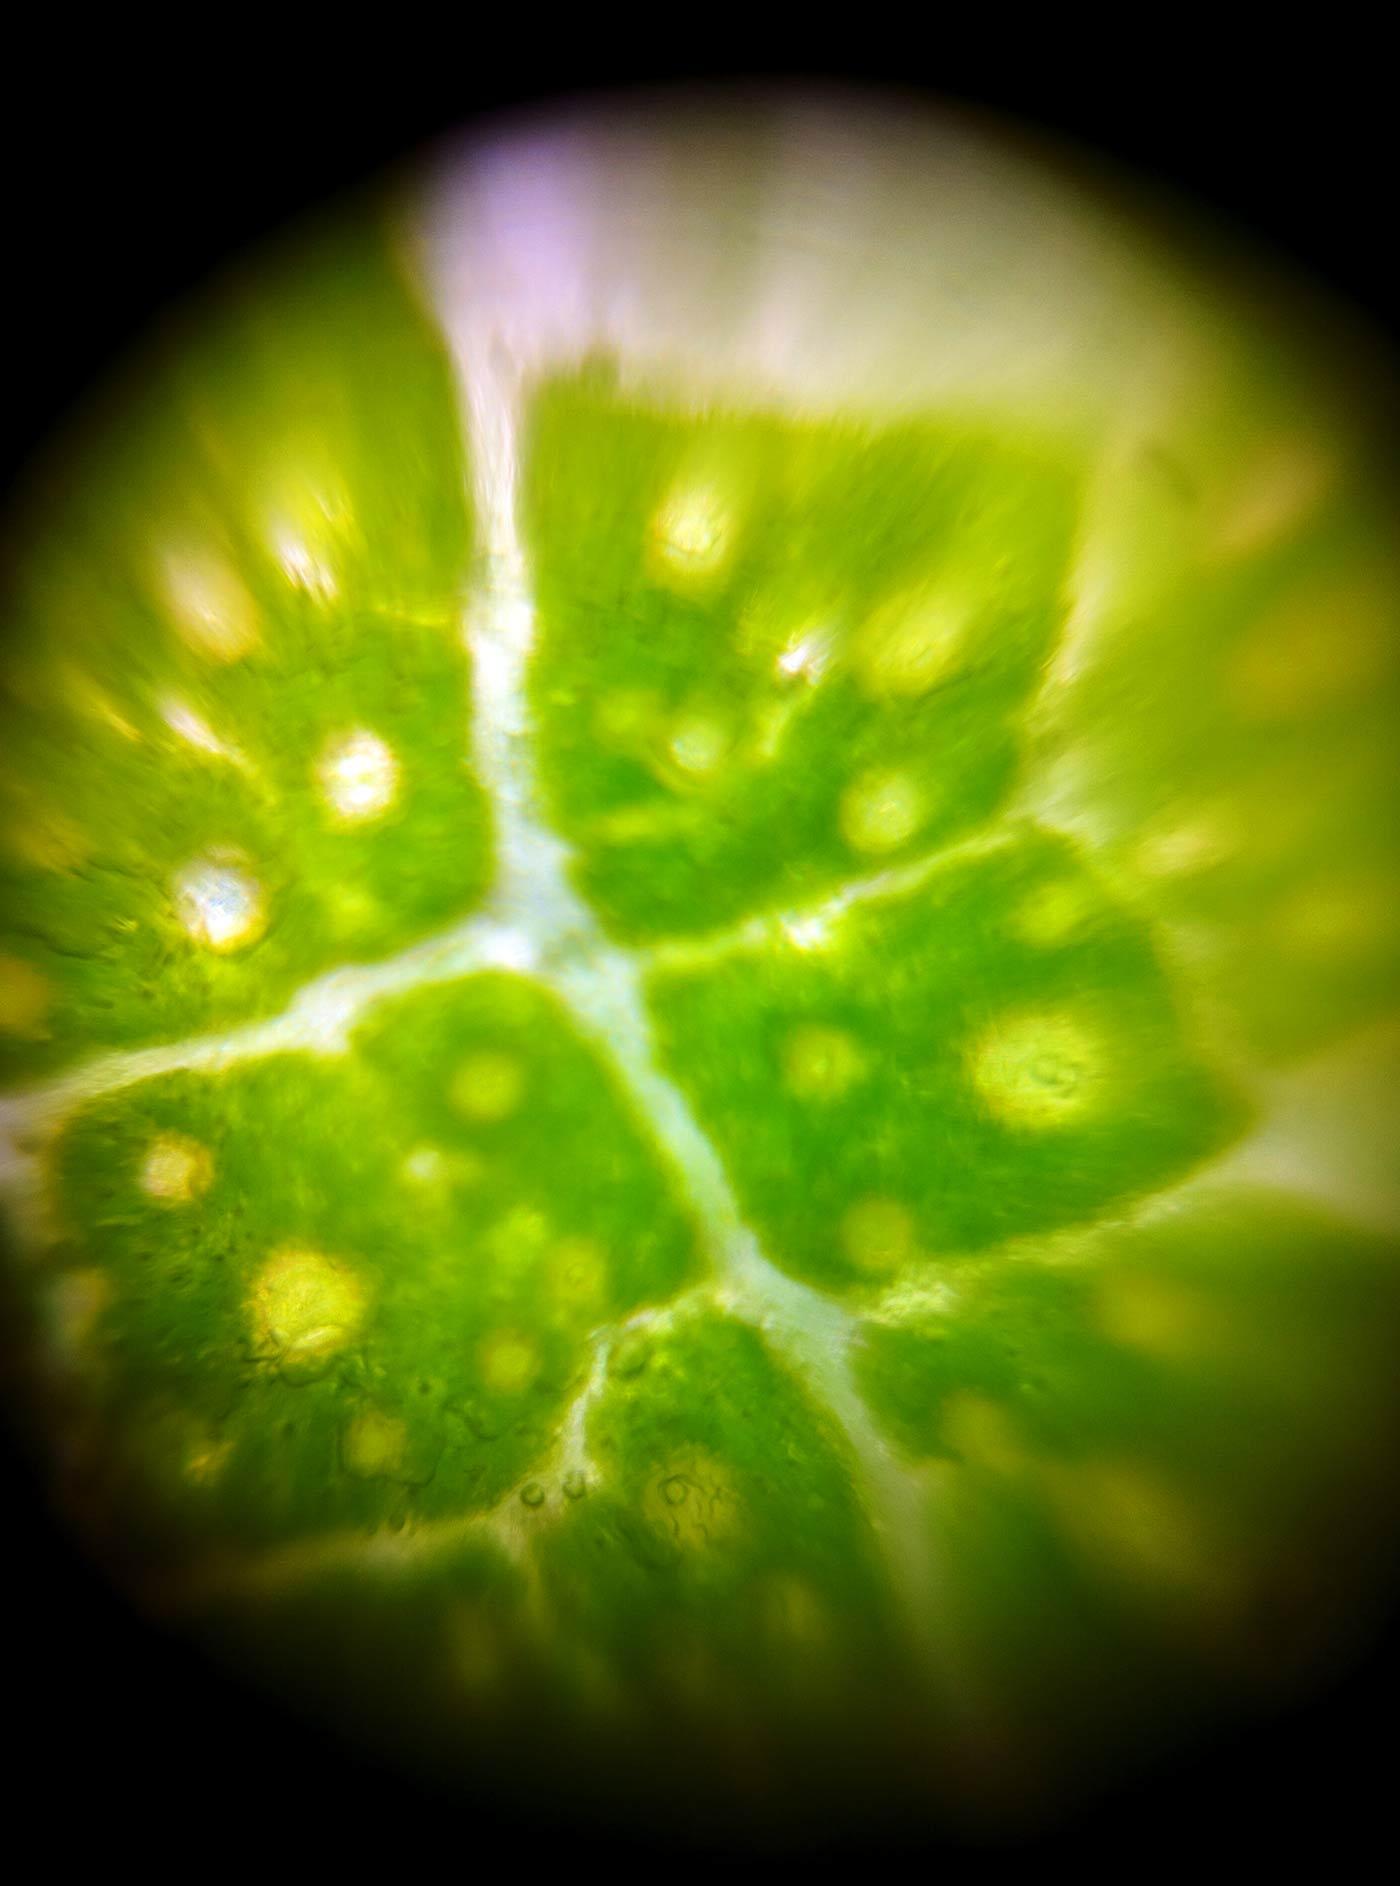 eucalyptus leaf through the Foldscope